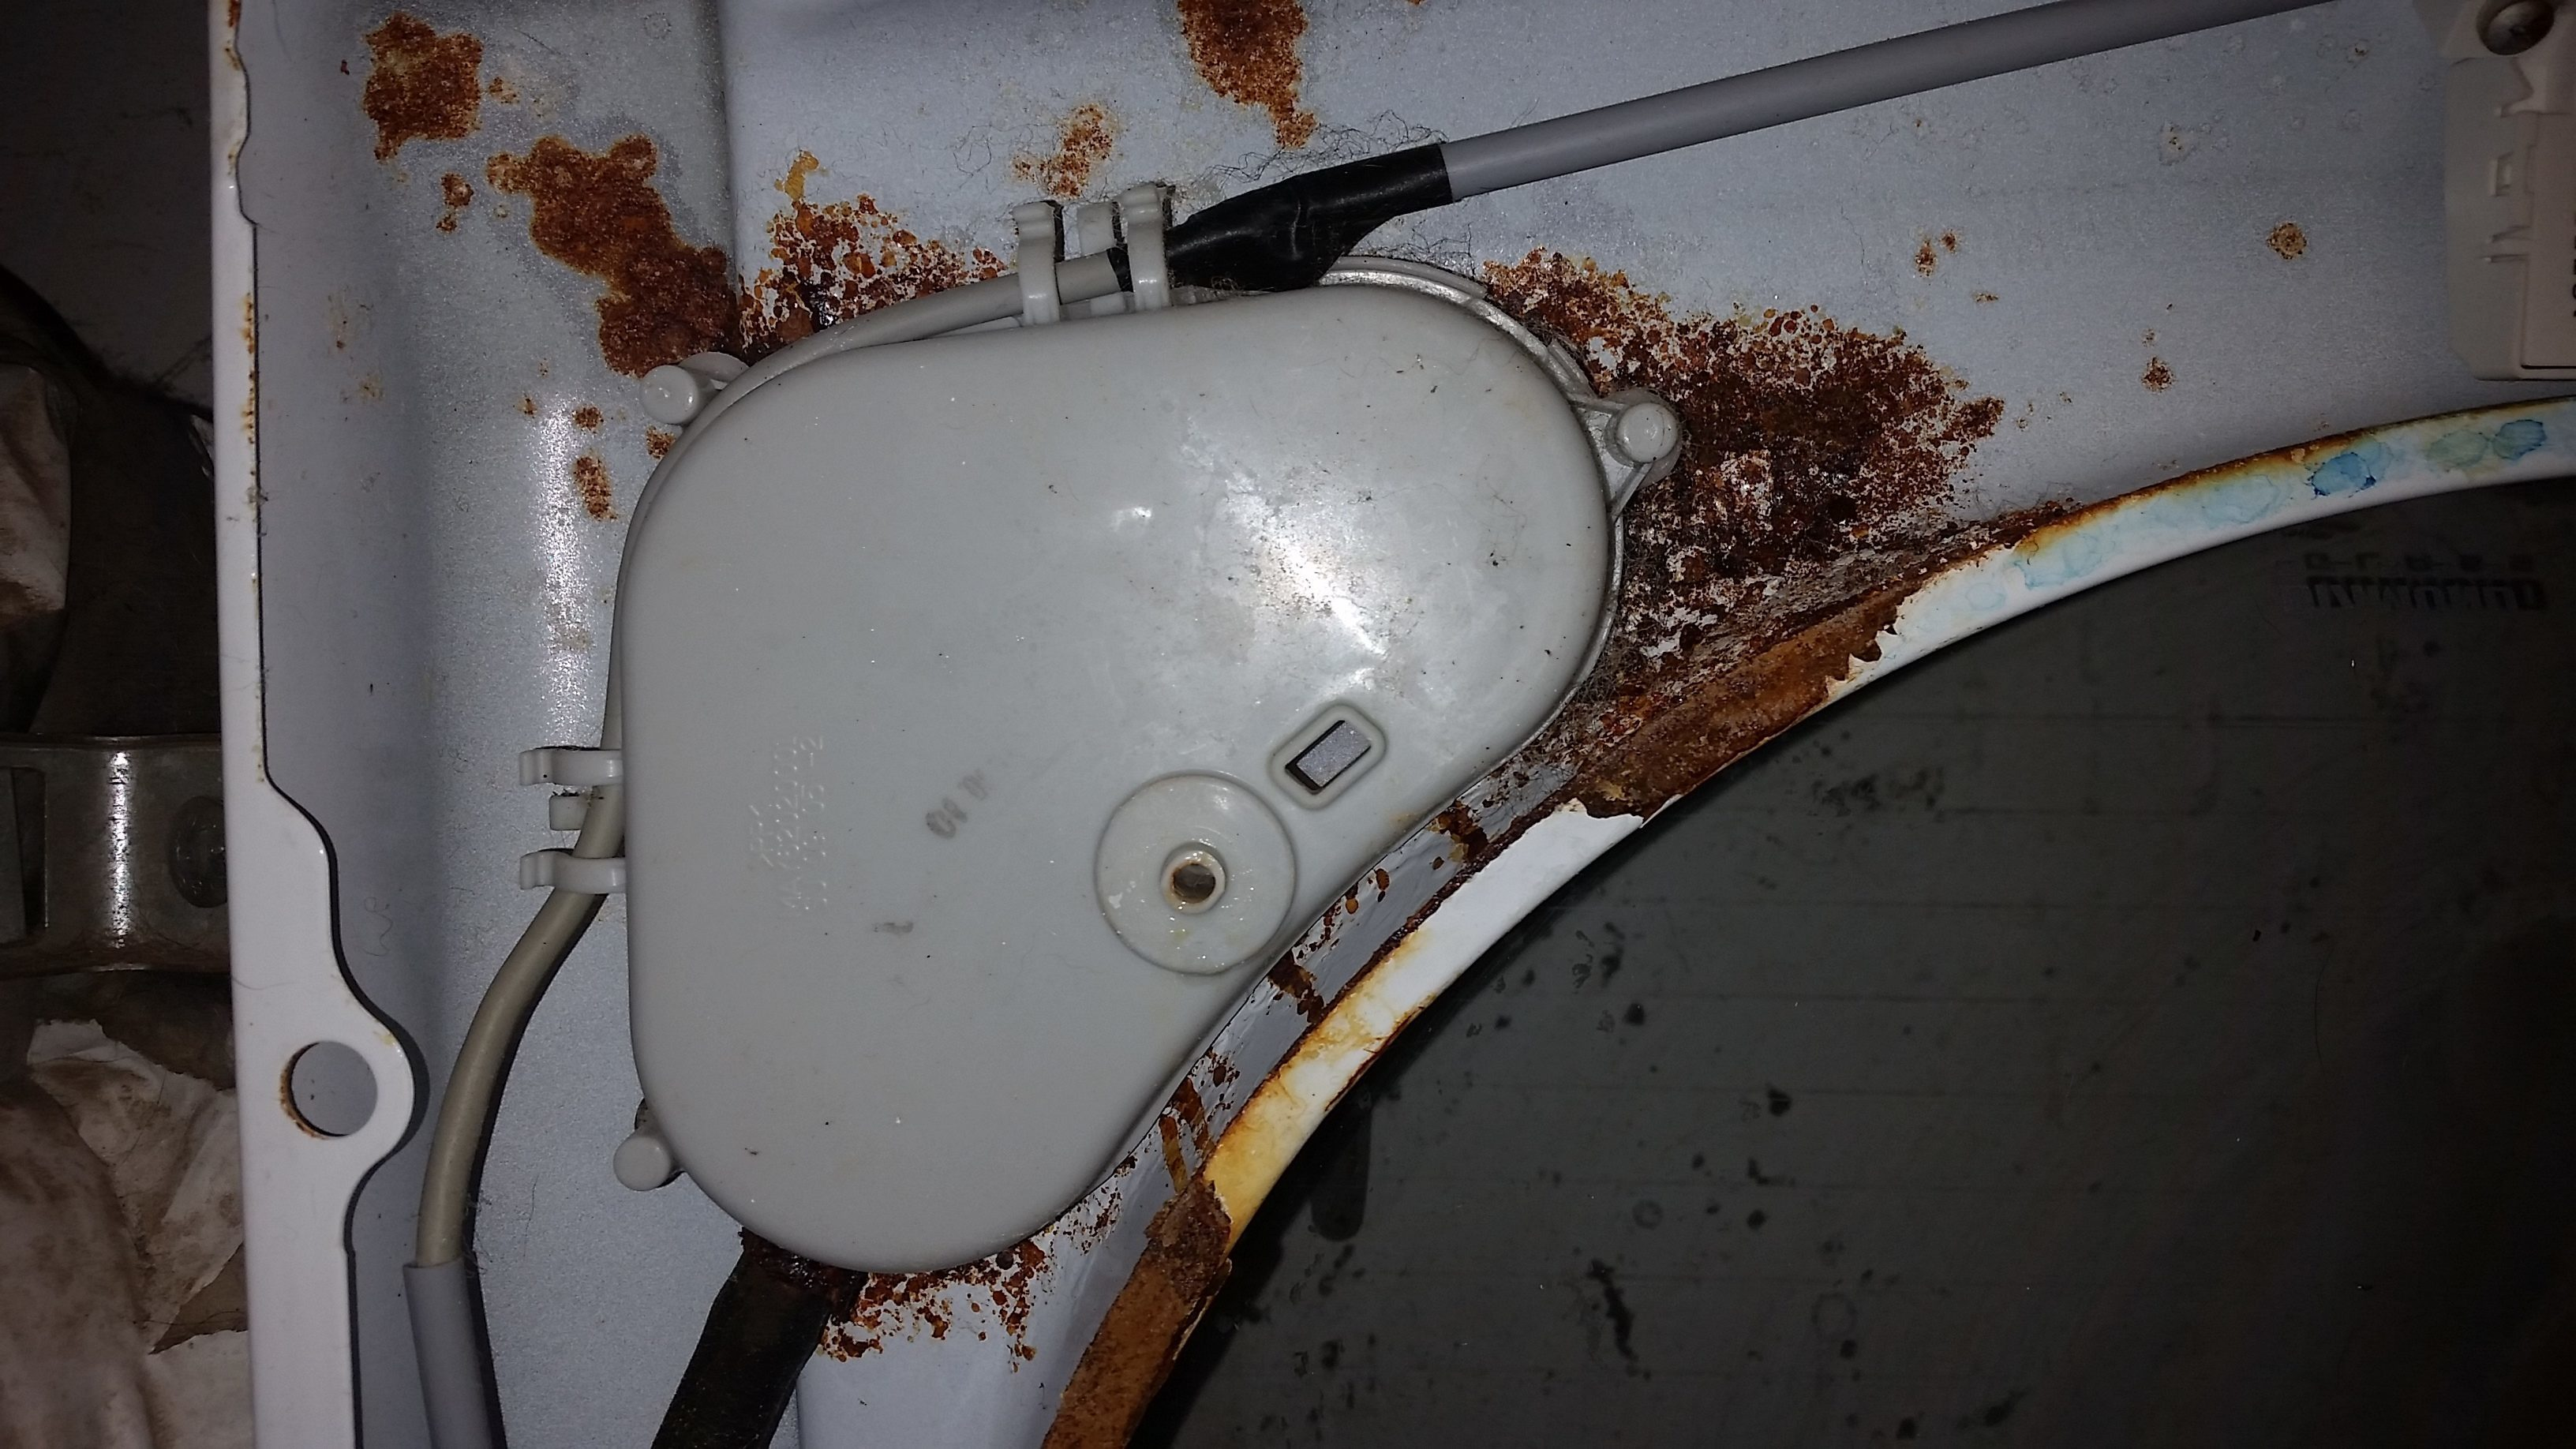 lg top loader washing machine leaking water from bottom